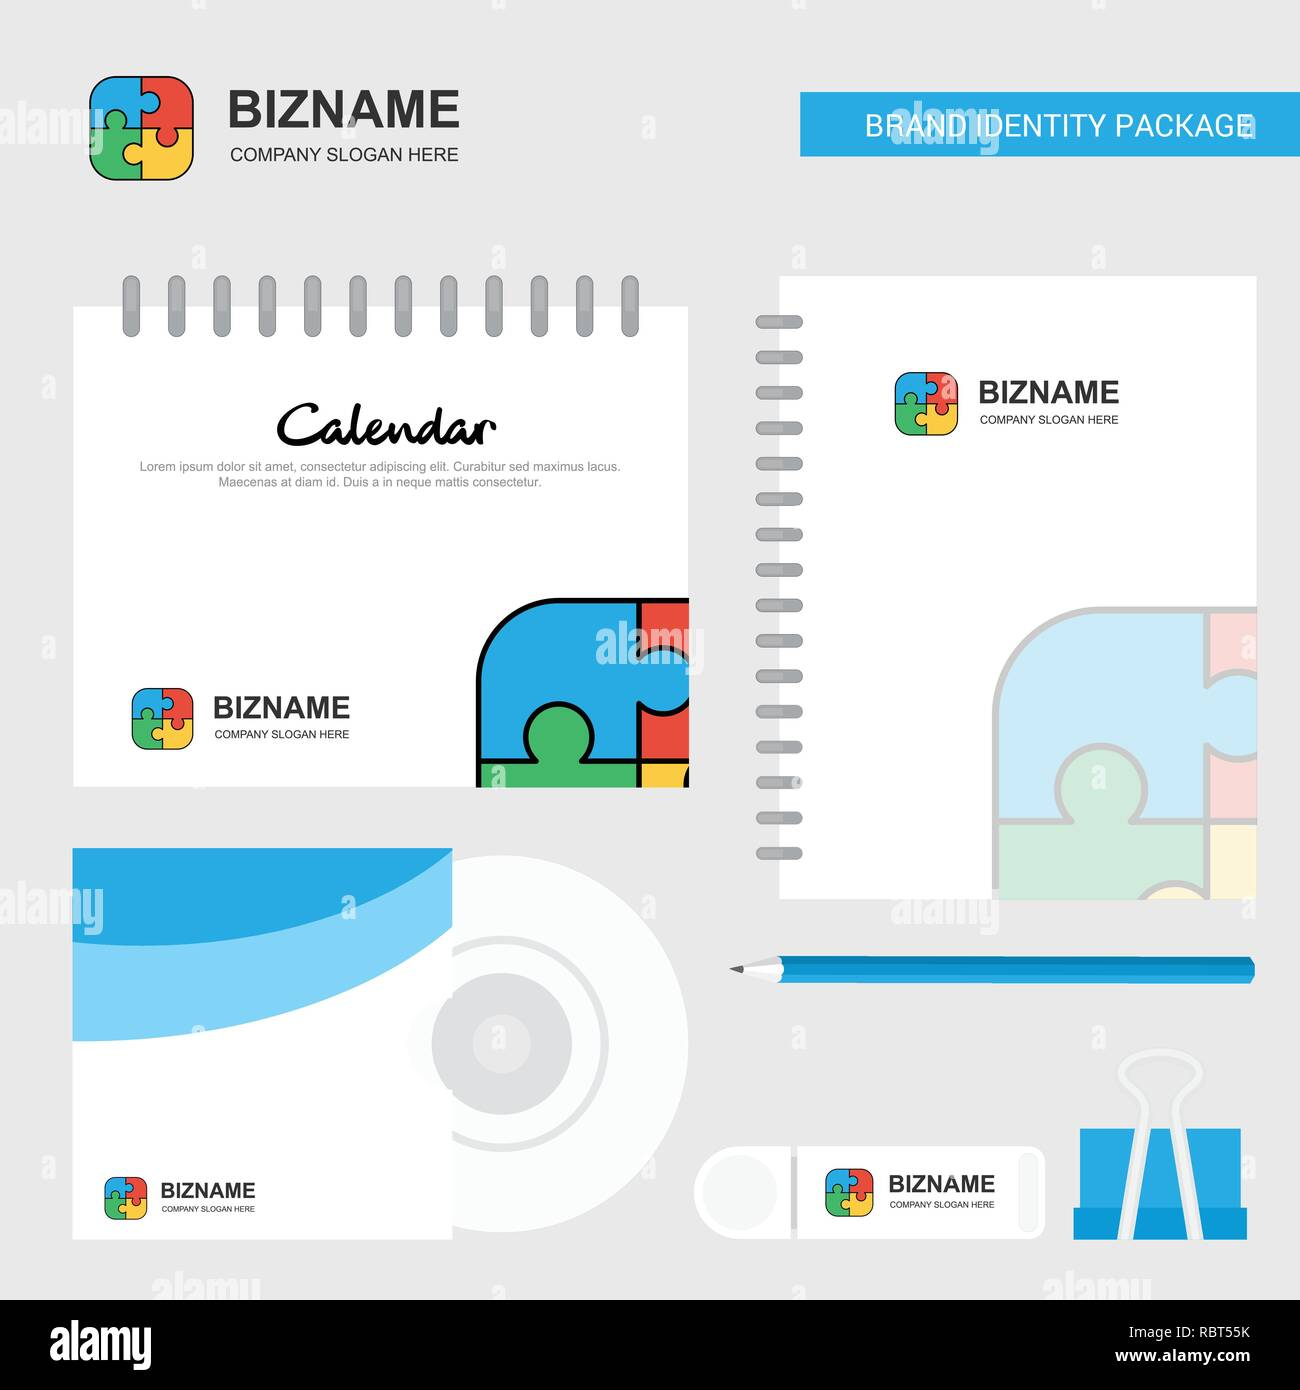 Calendario Diario.Juego De Puzzle Logo Plantilla Calendario Diario Y Tapa